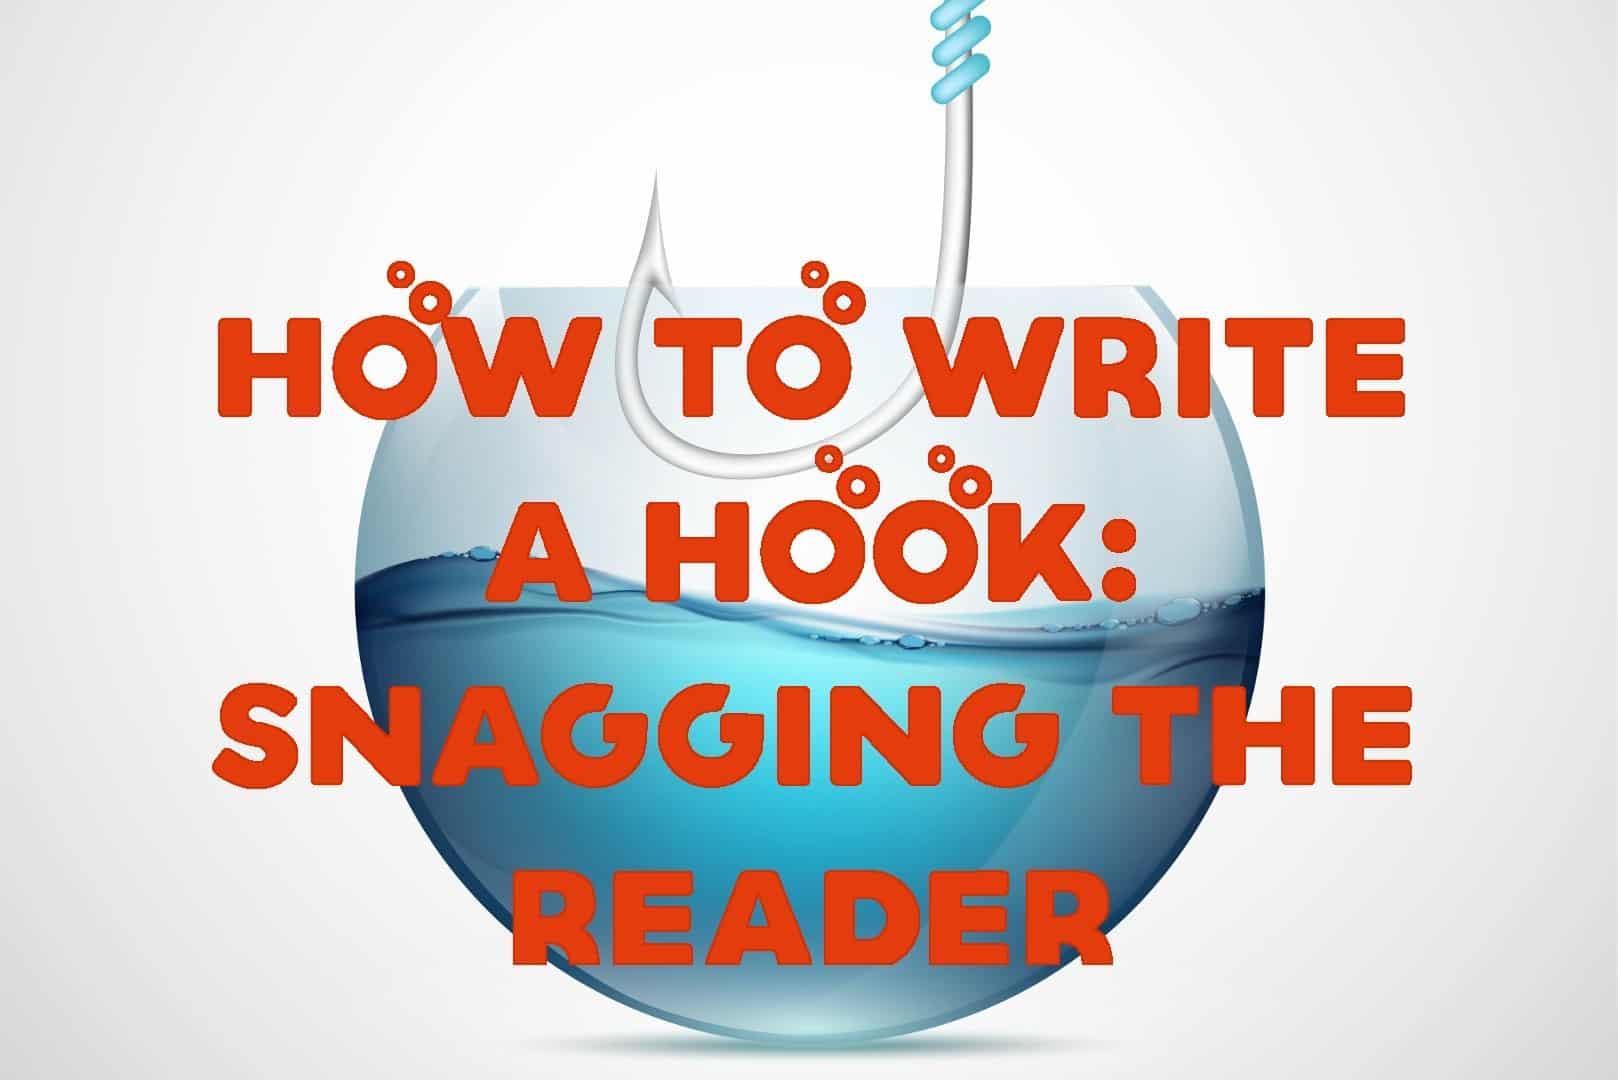 how to write a hook